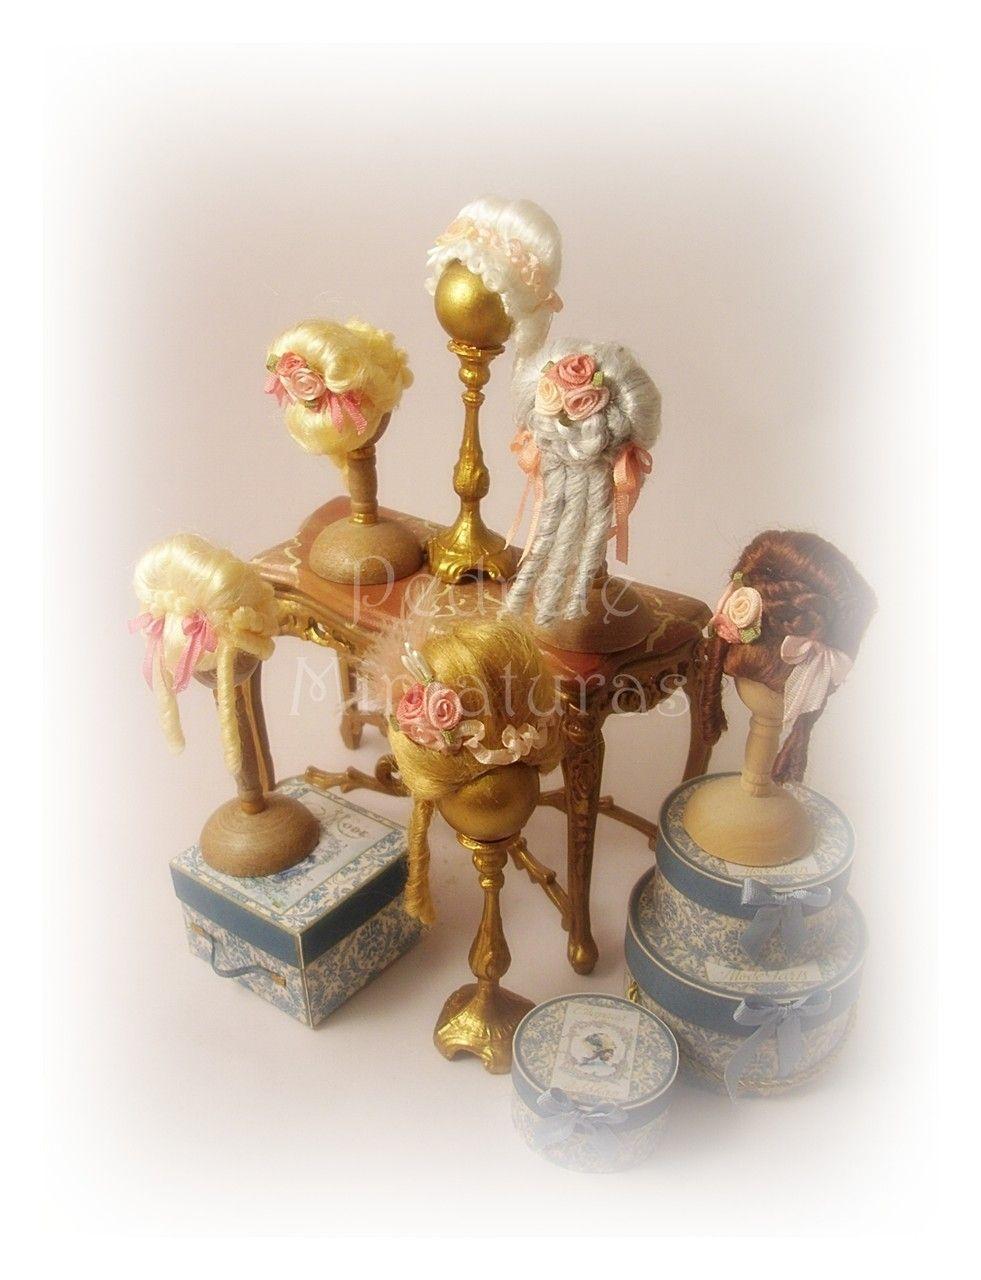 Pedrete Miniaturas - Miniaturas Pedrete